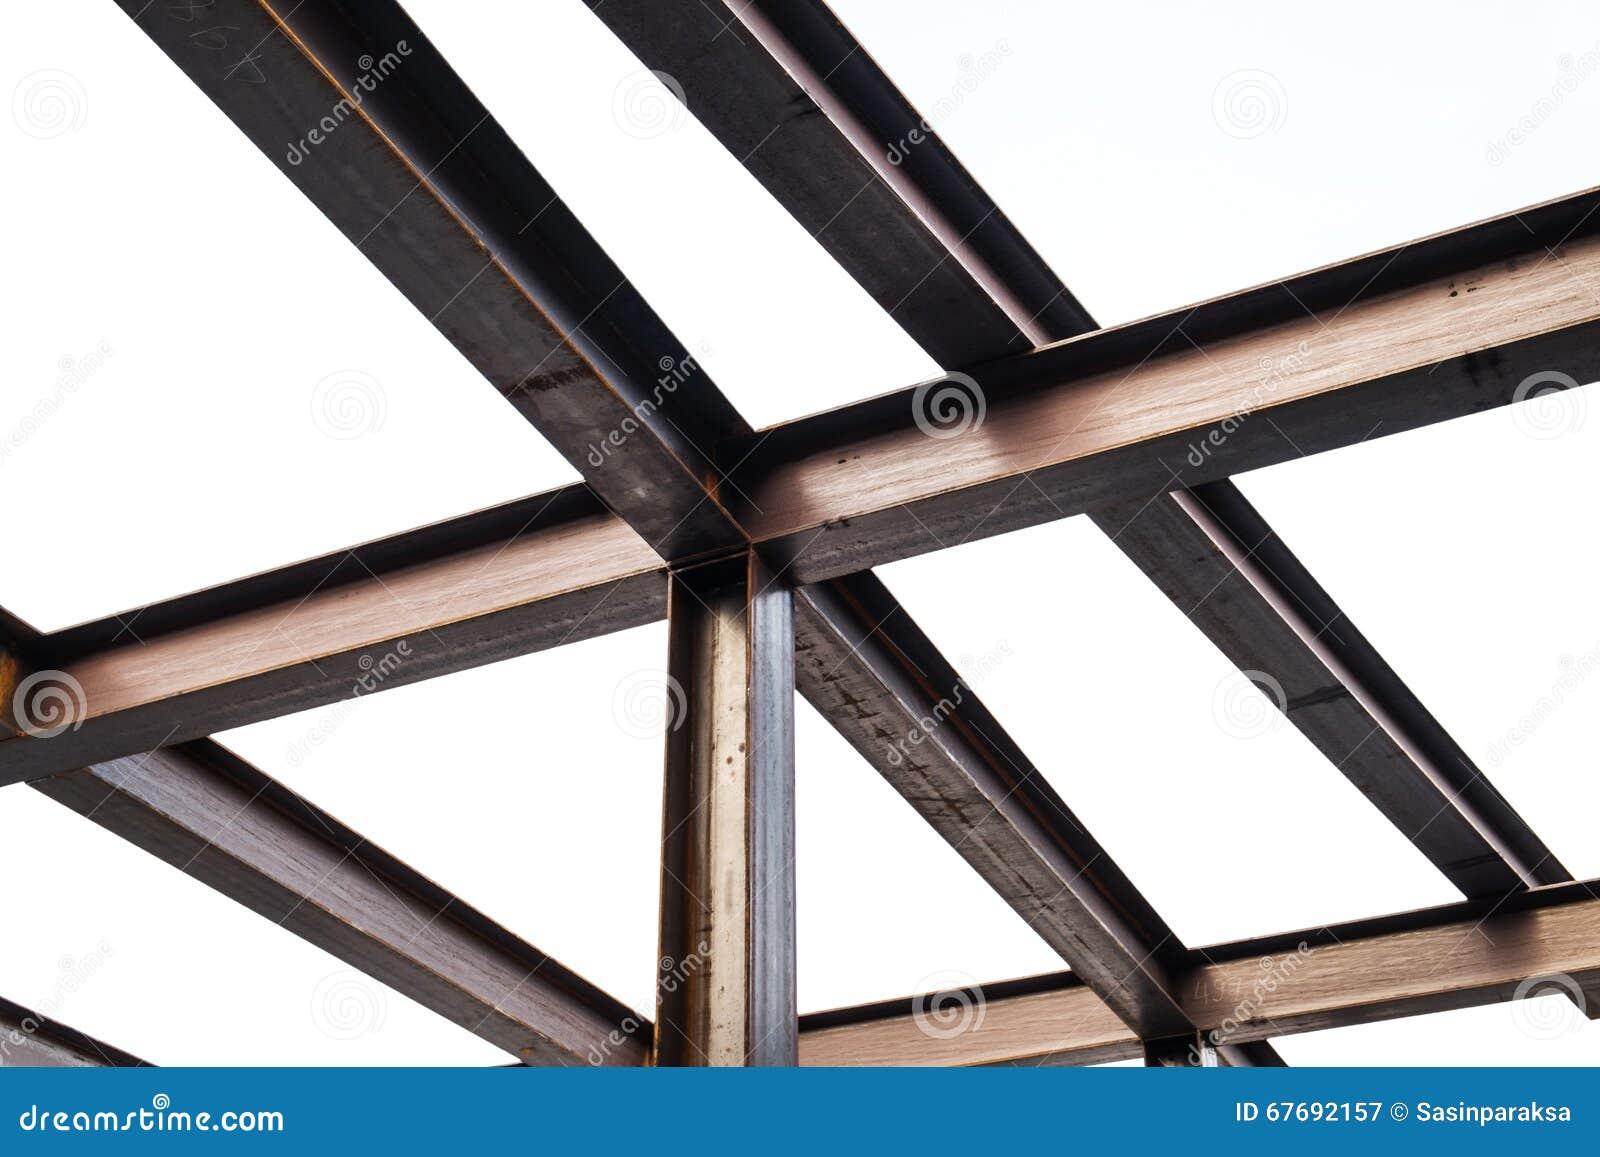 I Beam Steel Construction Isolated On White Background